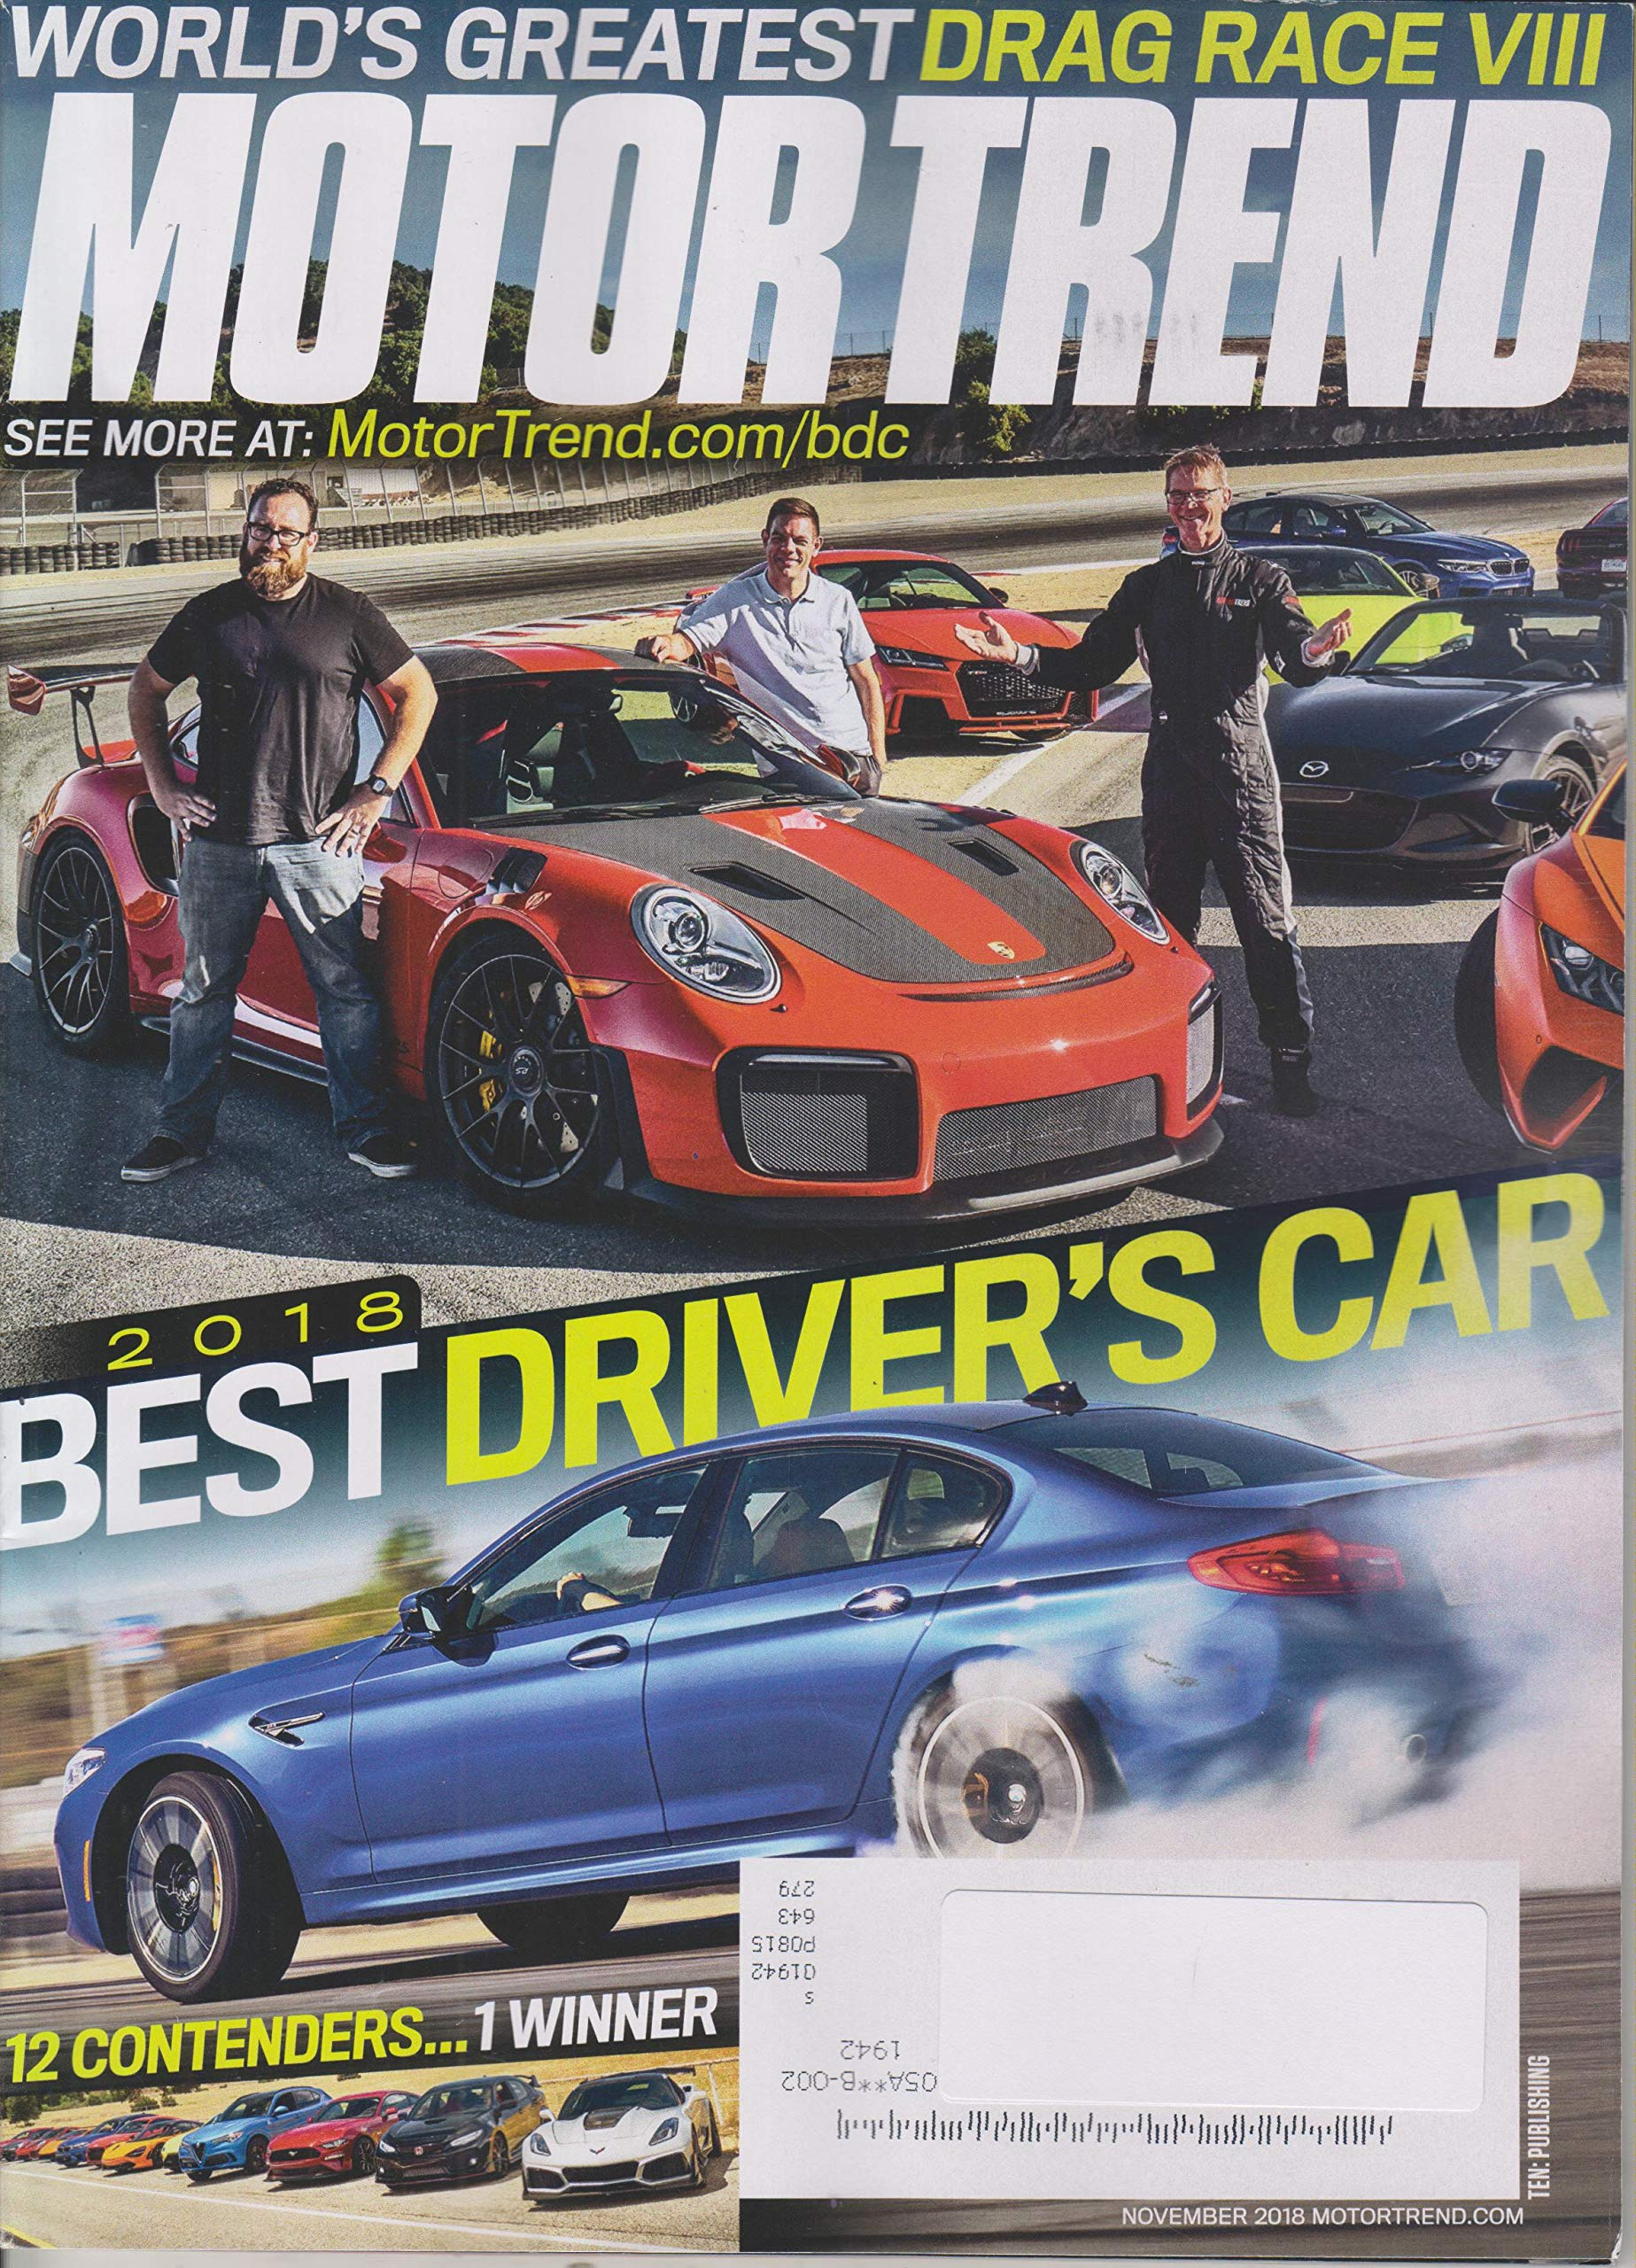 motor trend 2019 best driver\'s car Motor Trend November 2018 2018 Best Driver's Car 12 Contenders